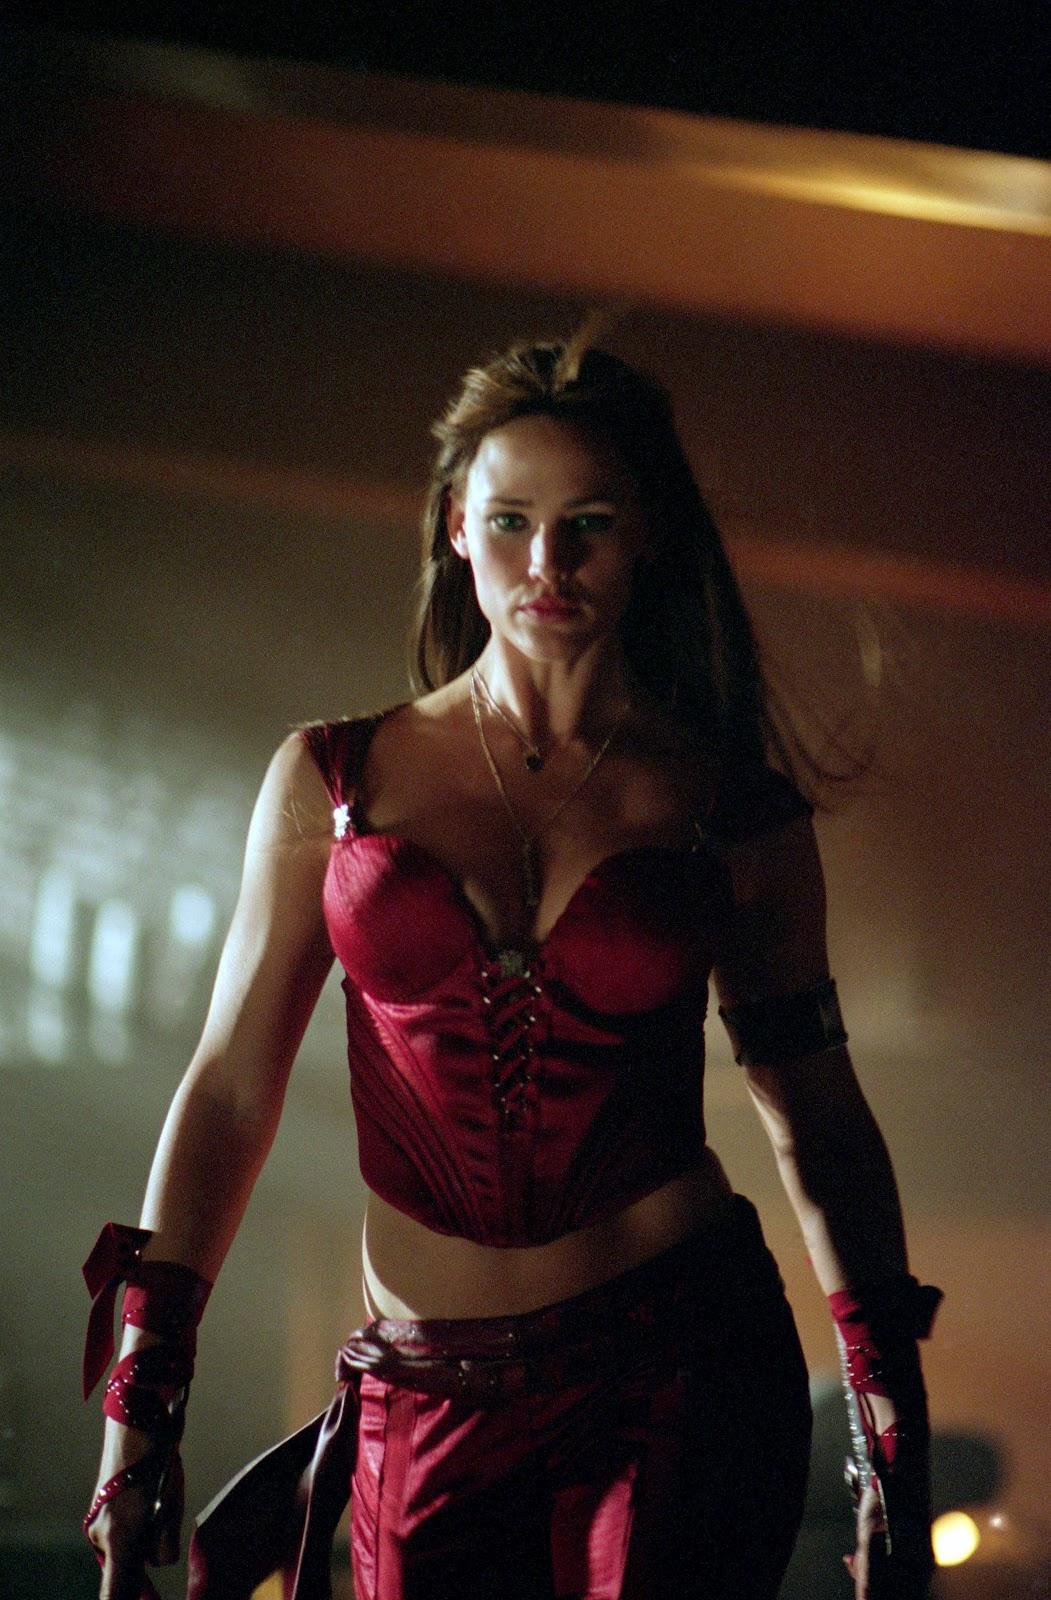 image Jennifer garner elektra the movie super sexy edit